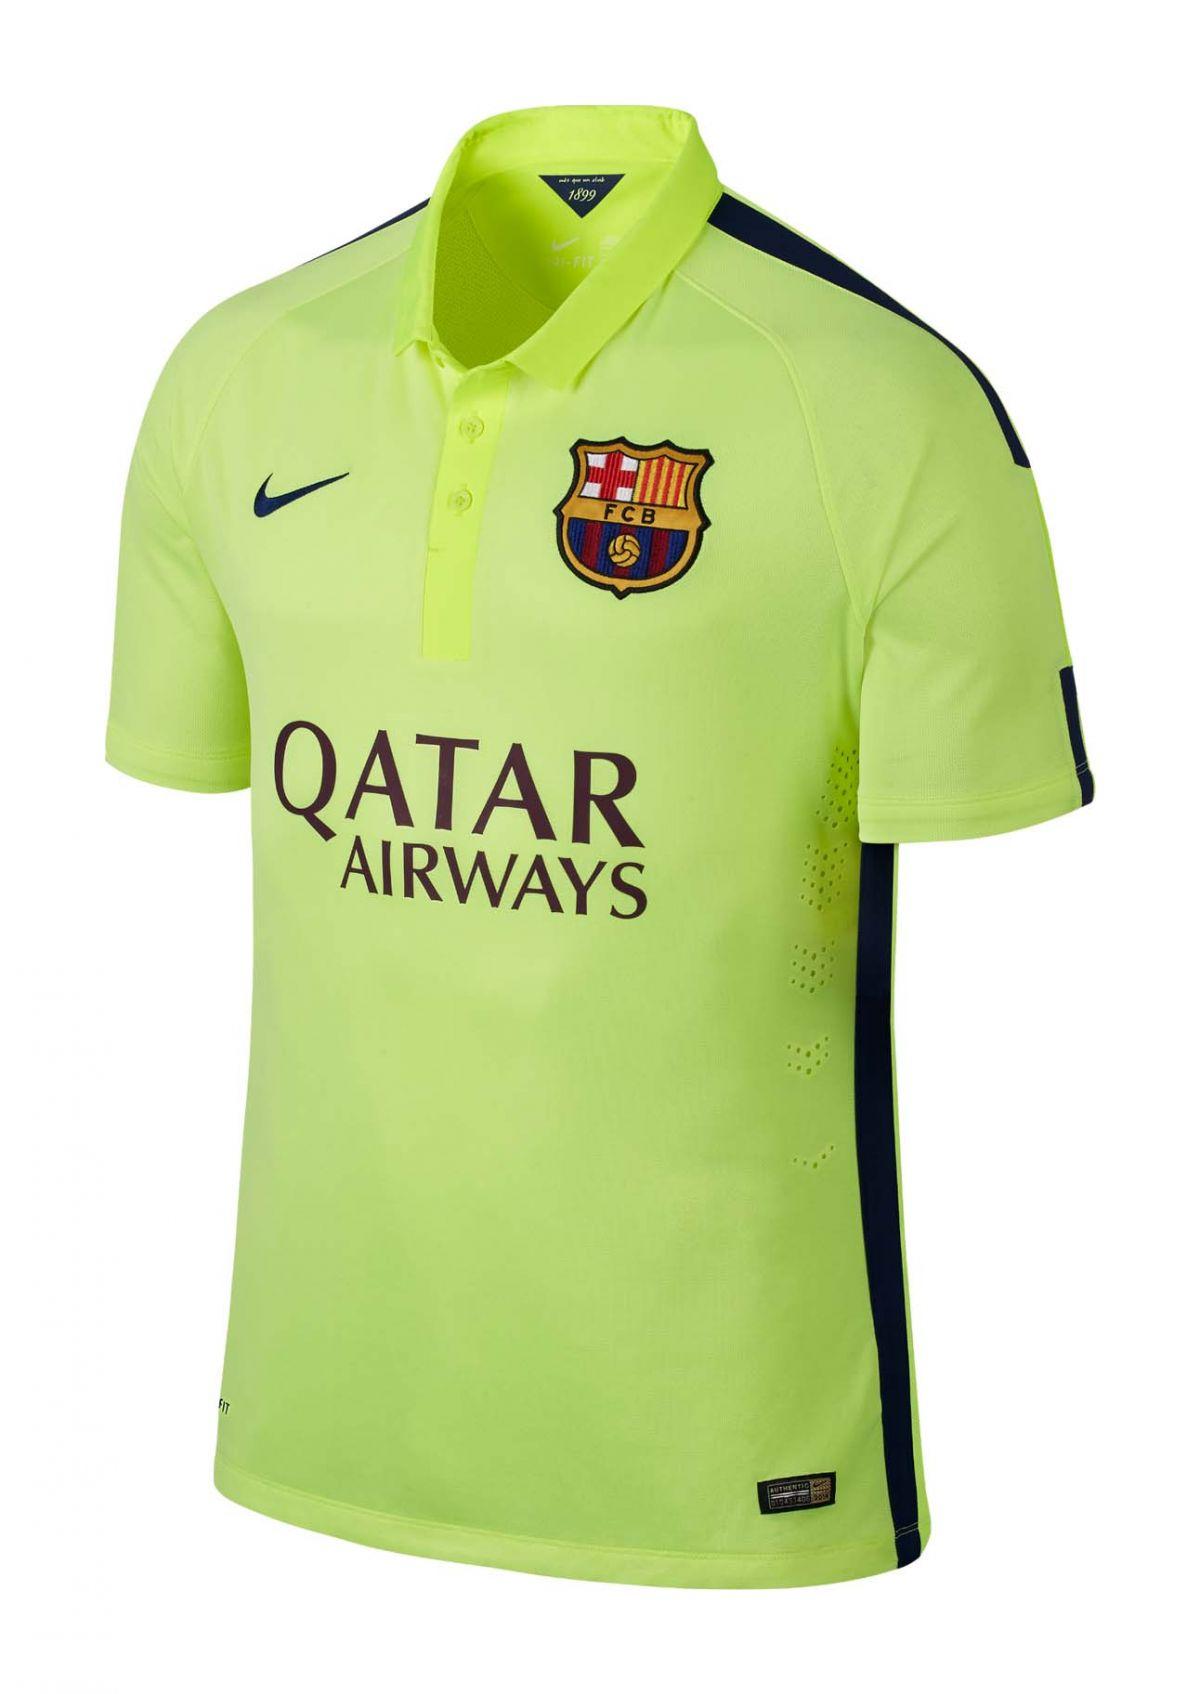 fc barcelona 2014 15 third kit fc barcelona 2014 15 third kit